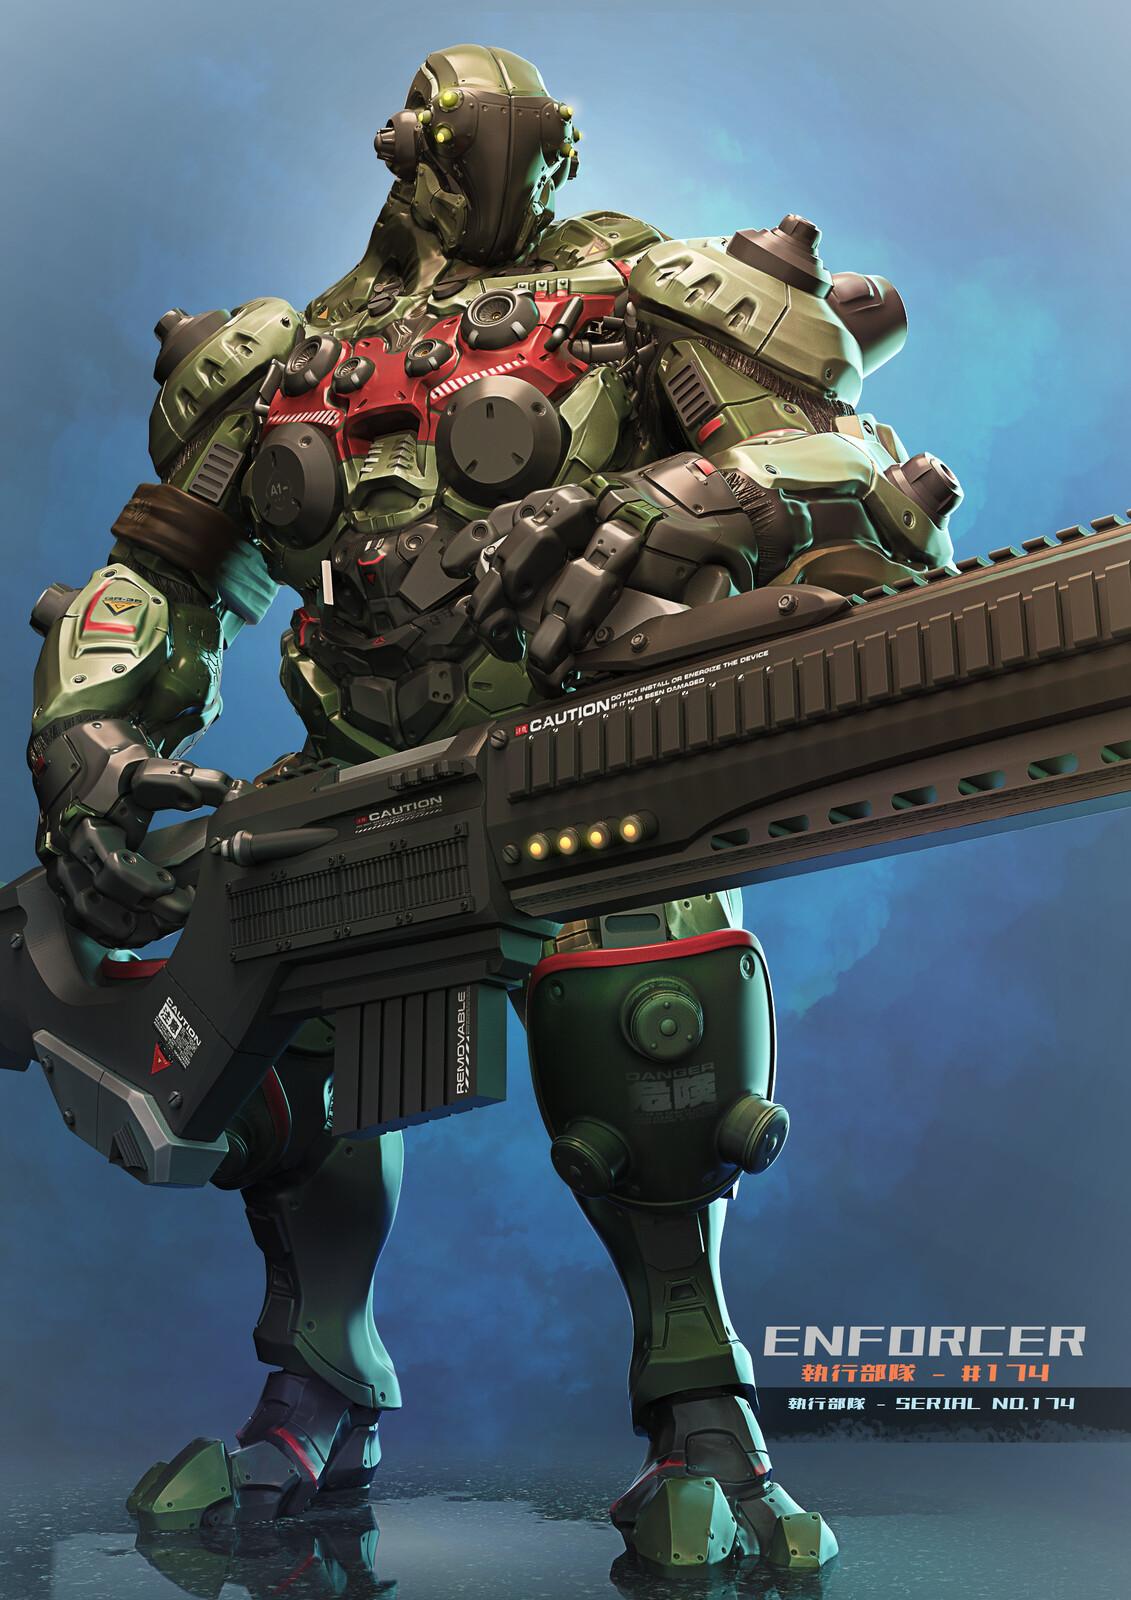 Military Police Enforcer Concept